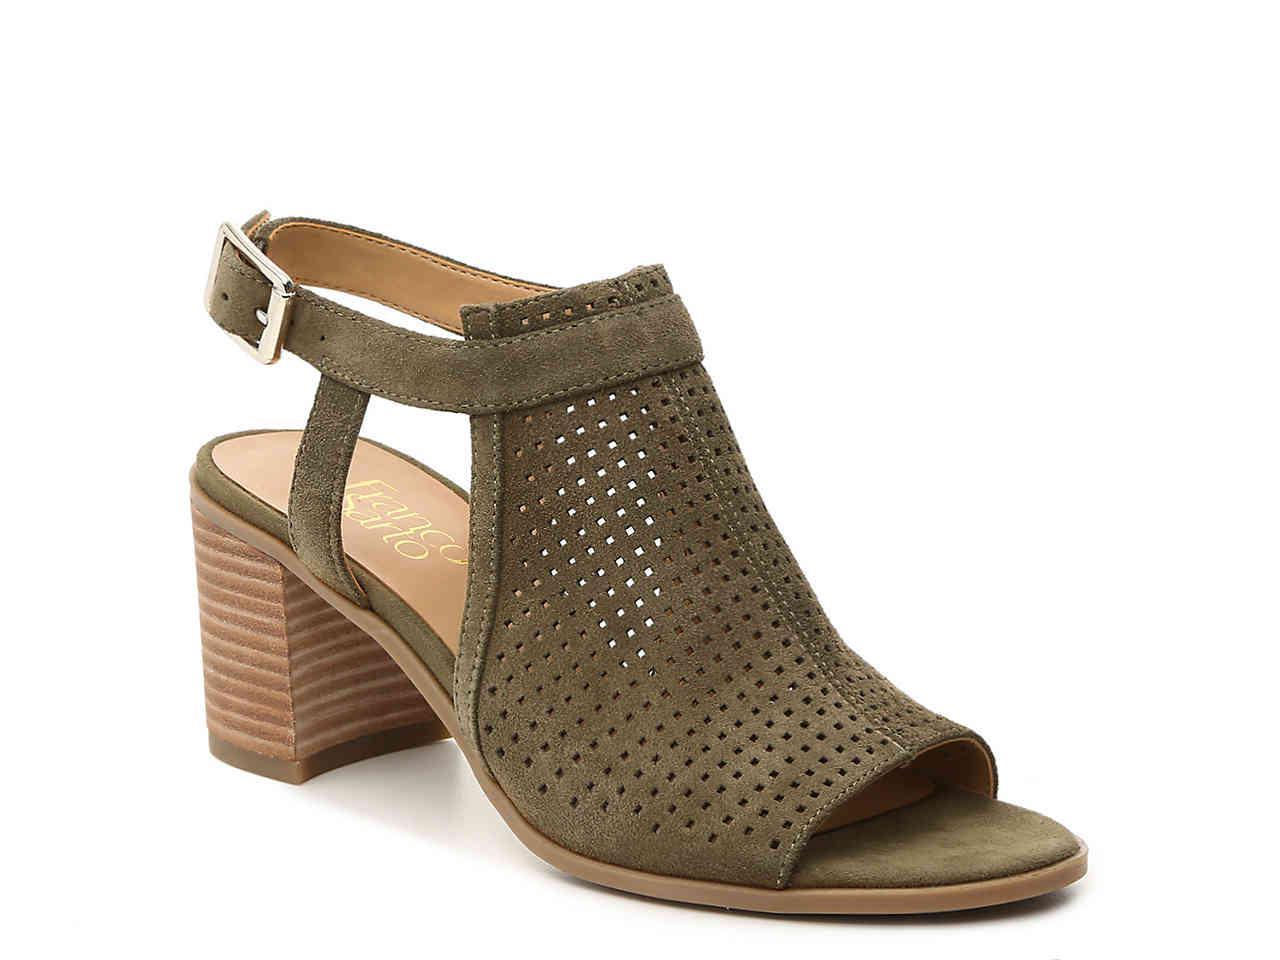 a49d58634079f Lyst - Franco Sarto Harlet 2 Sandal in Green